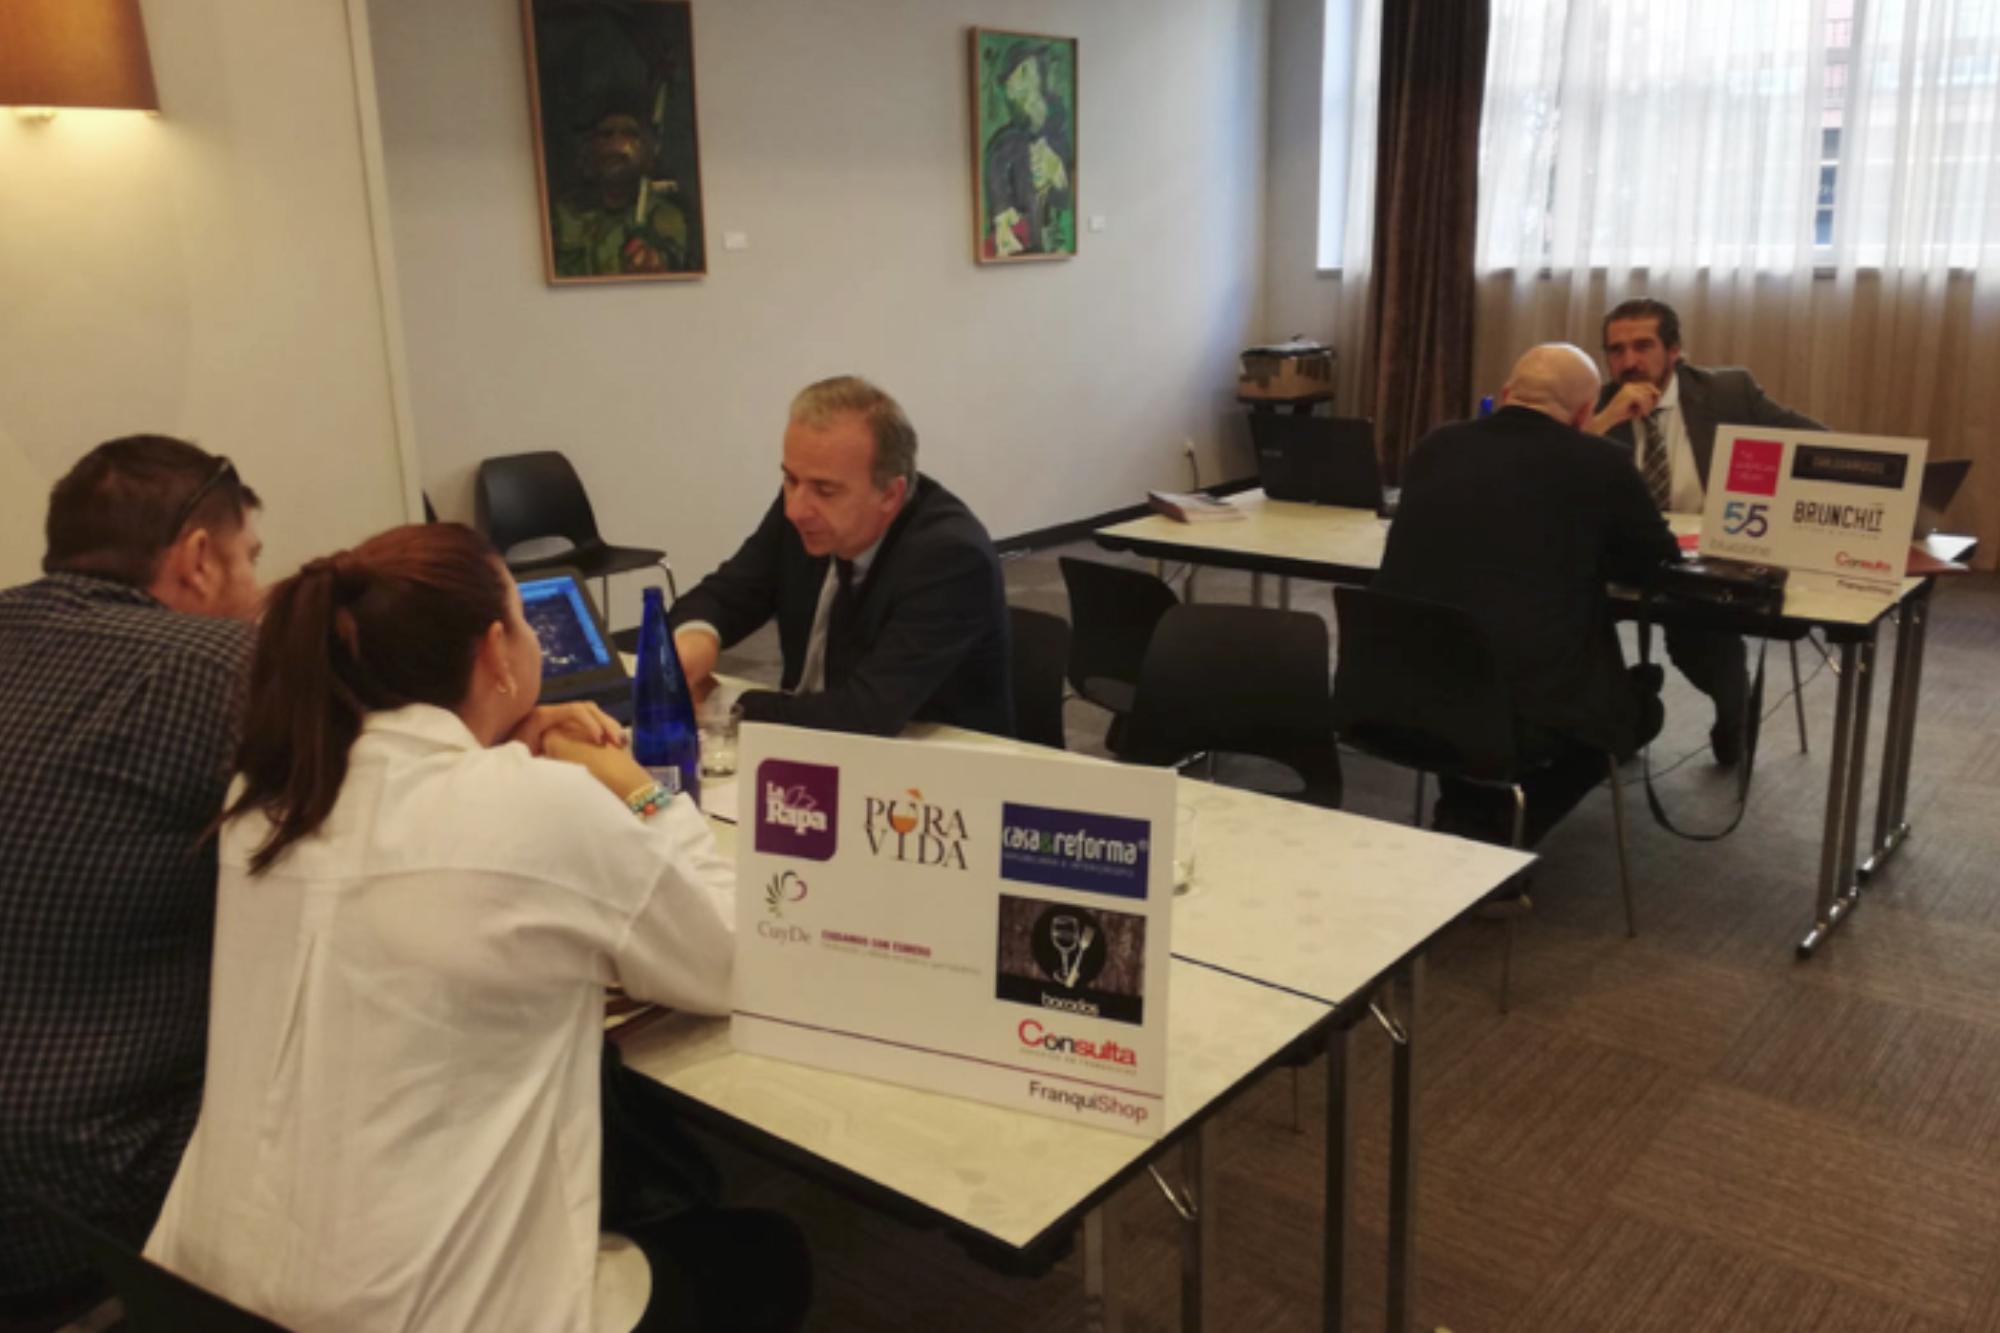 FranquiShop Madrid, un rotundo éxito para Consulta Franquicias